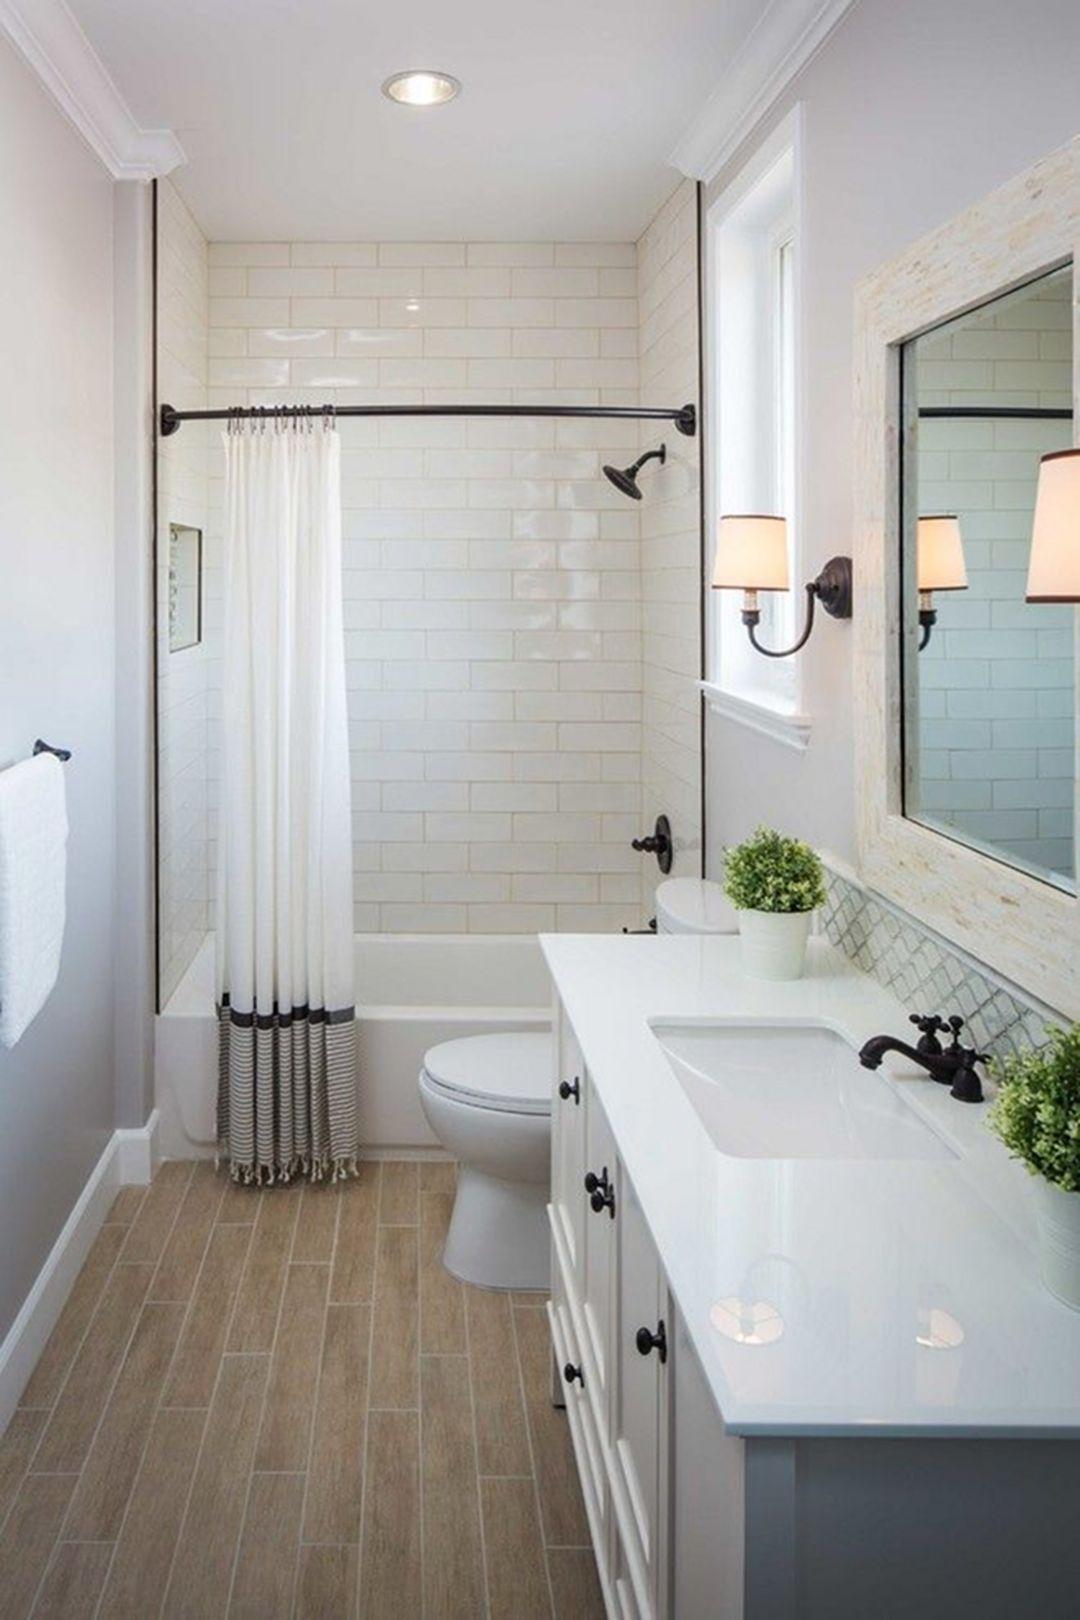 30 amazing small bathroom wall tile ideas to inspire you on amazing small bathroom designs and ideas id=14112